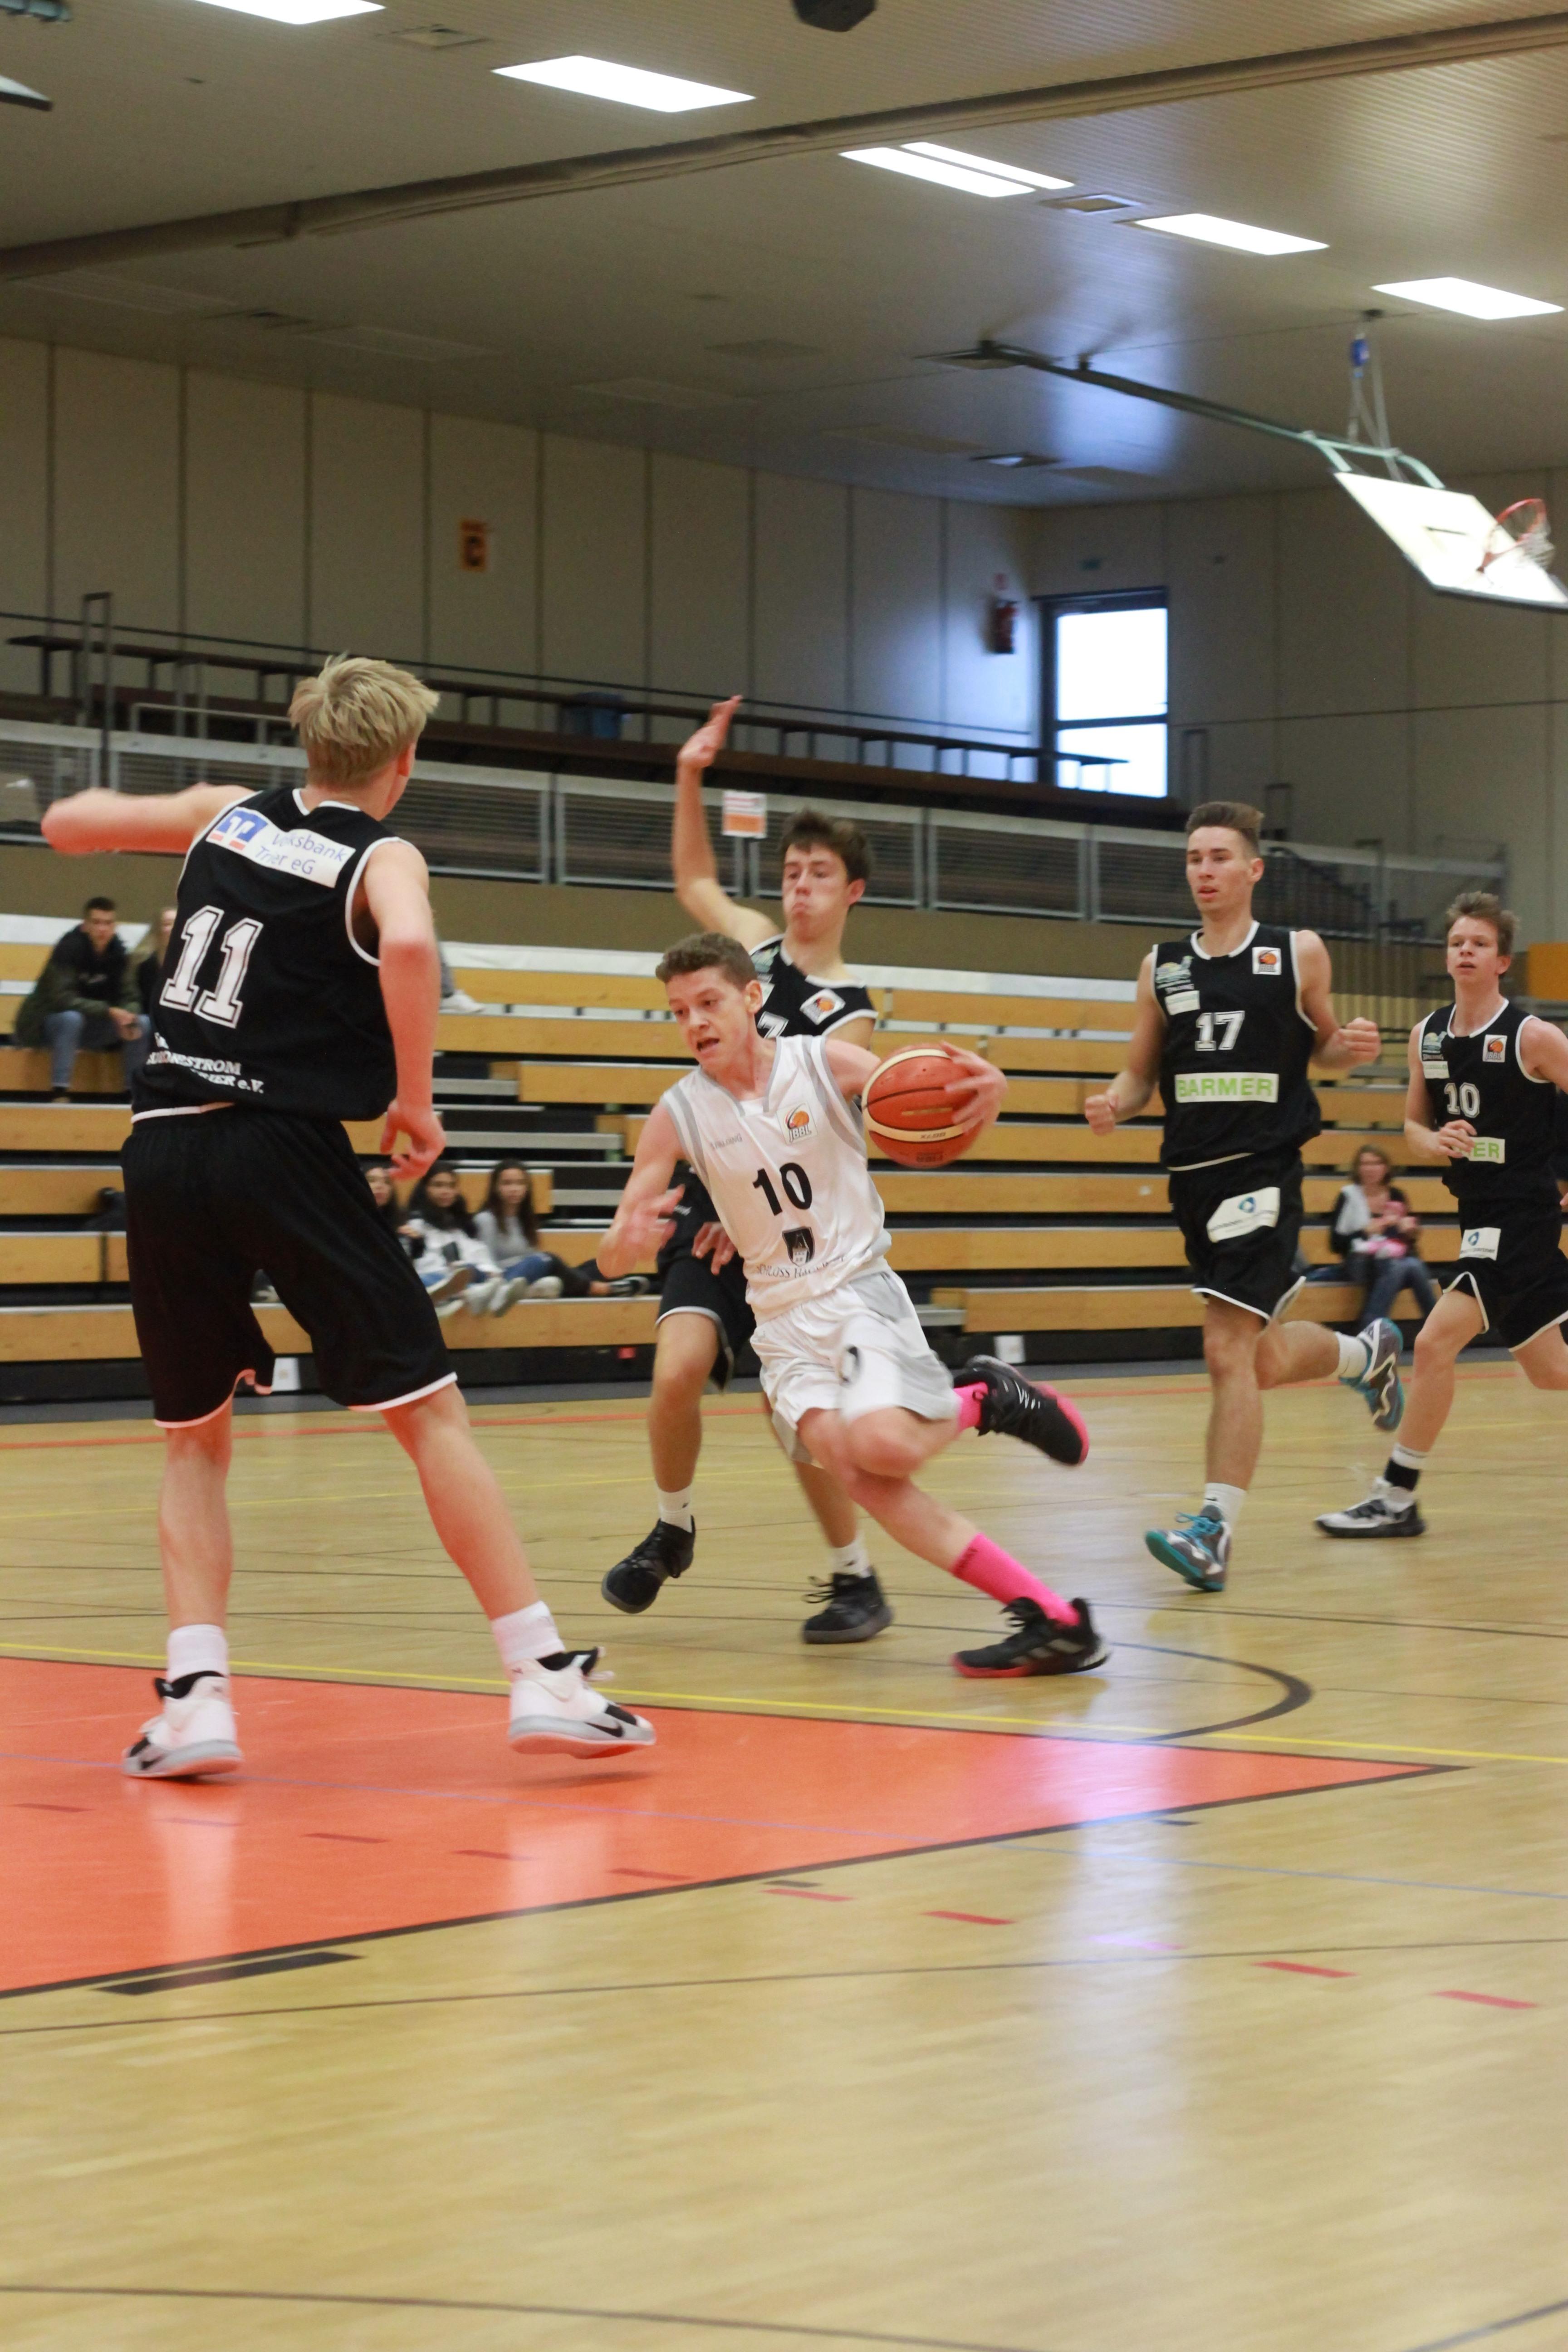 JBBL_19-20_Team_Bonn-Rhöndorf_Youngstars_Trier_2._Spieltag_Jonah_Völzgen